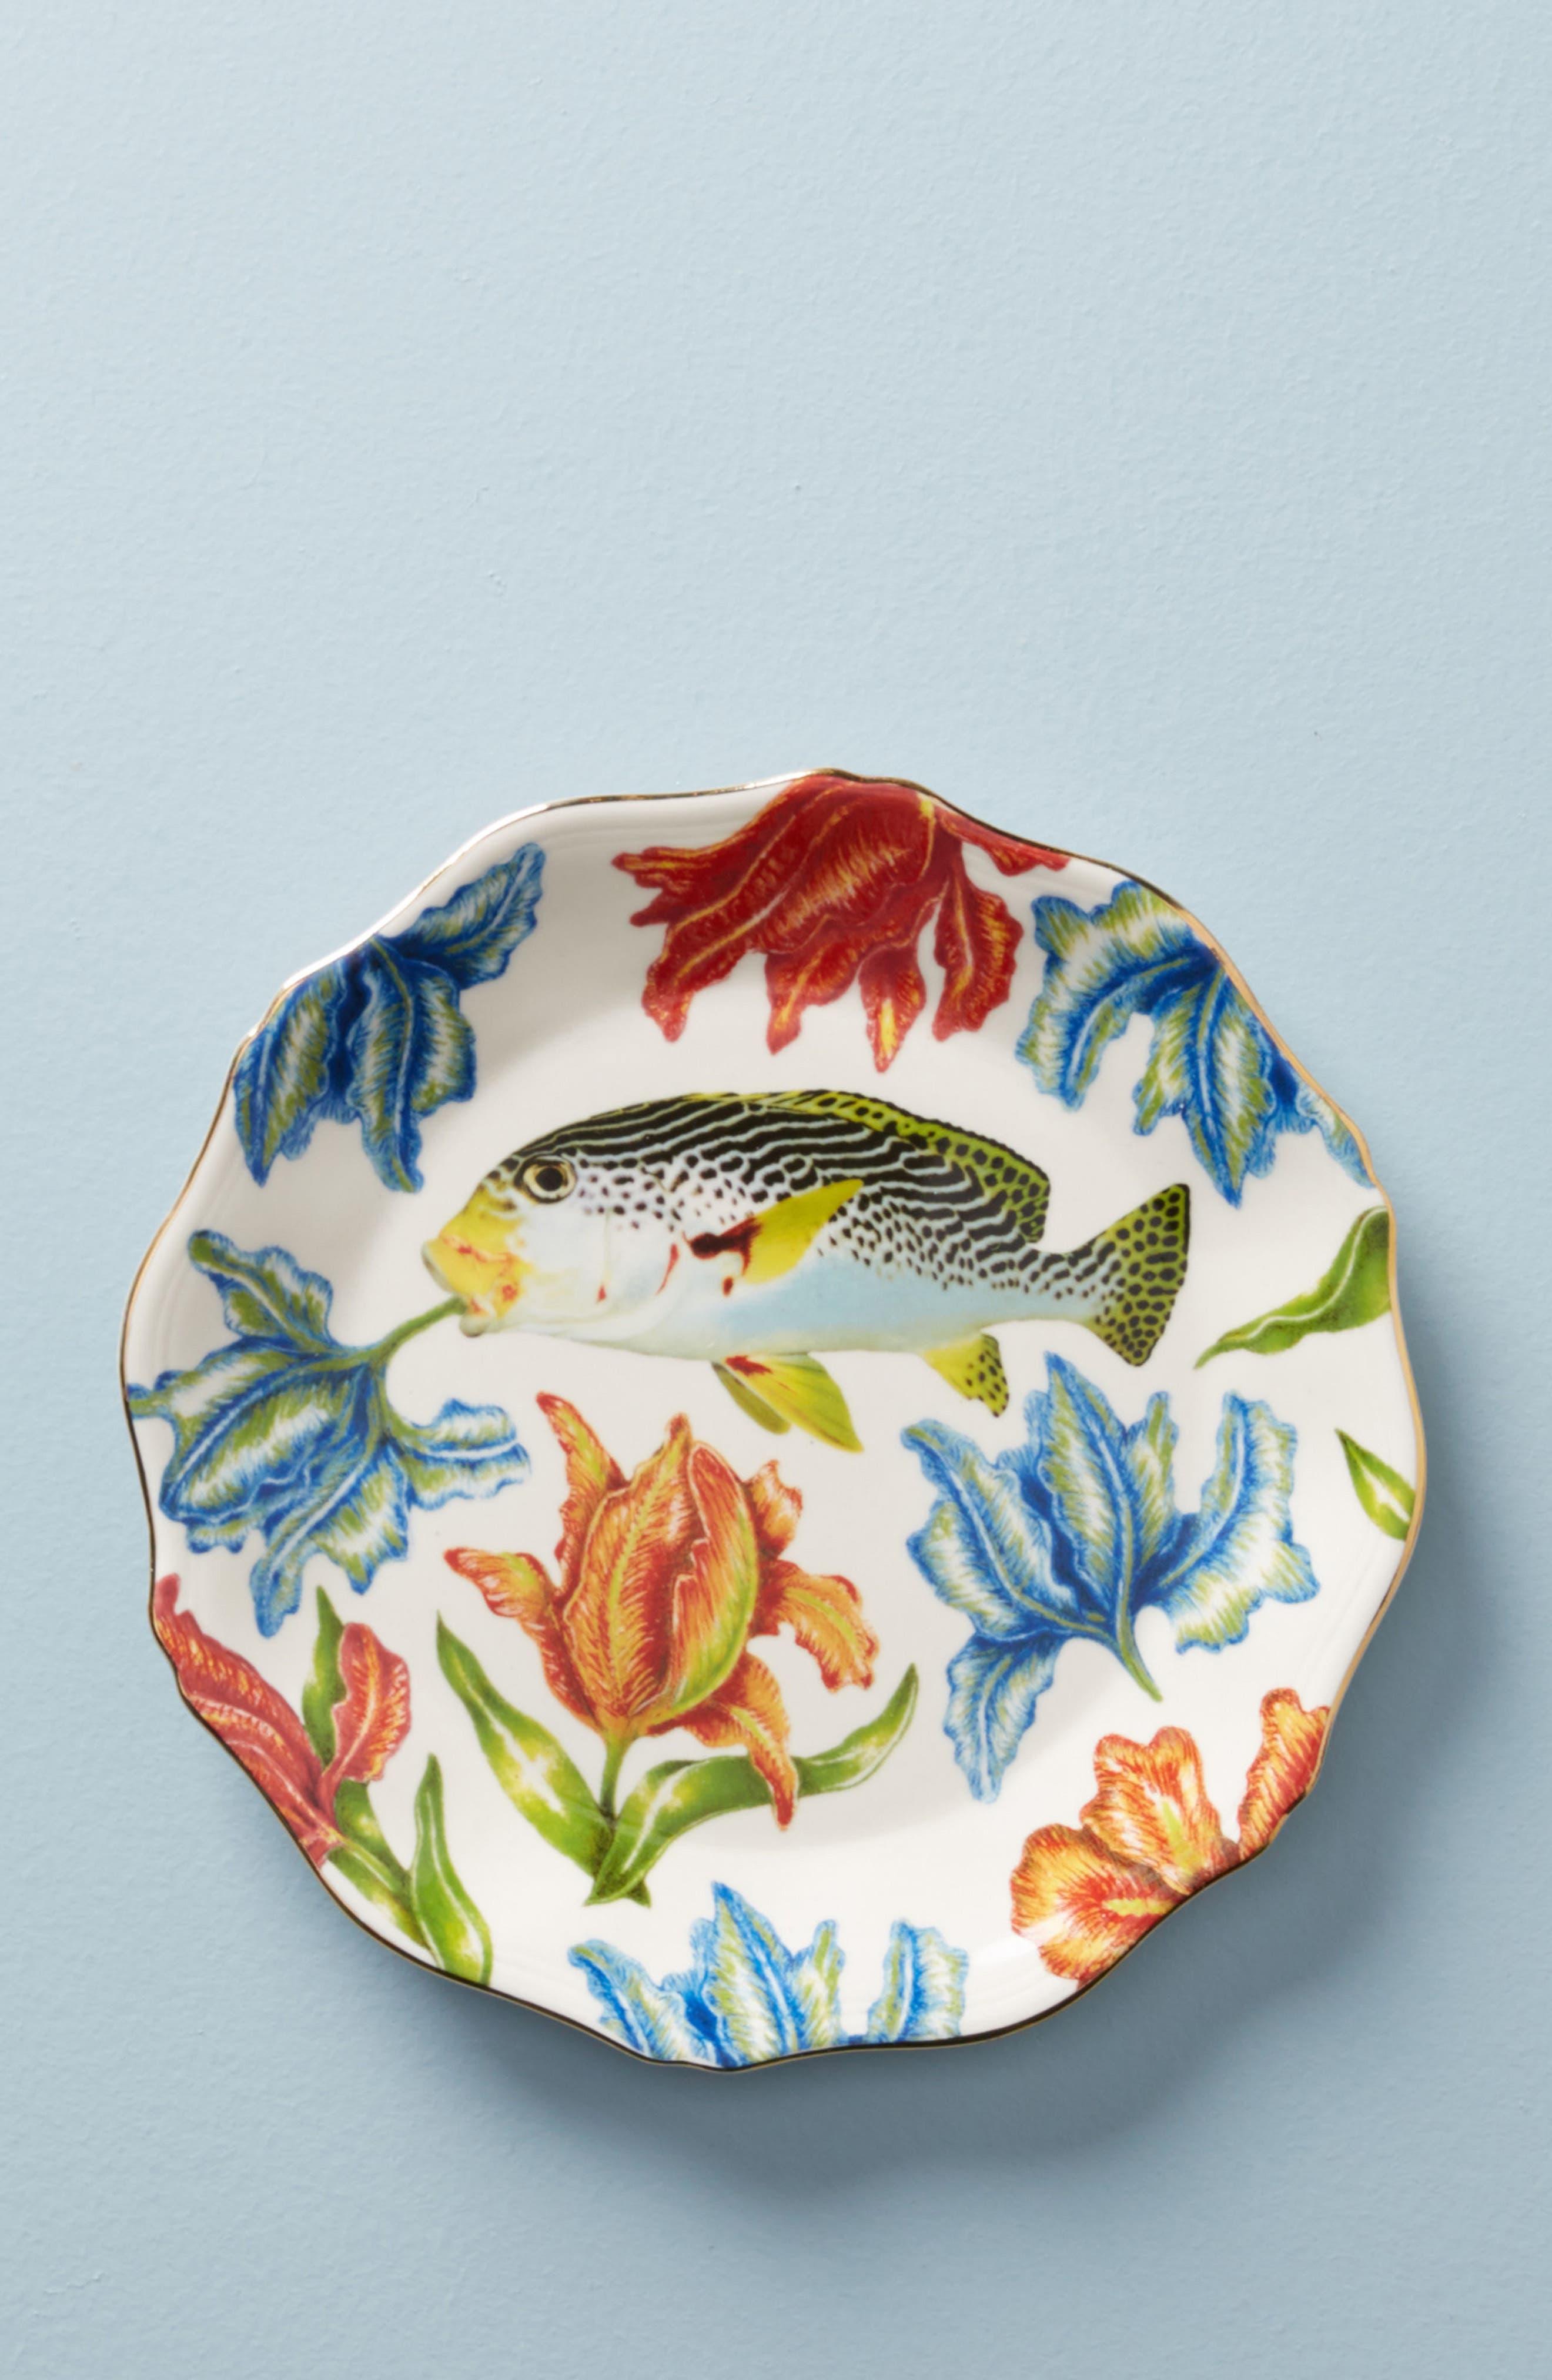 Anthropologie Nature Table Dessert Plate